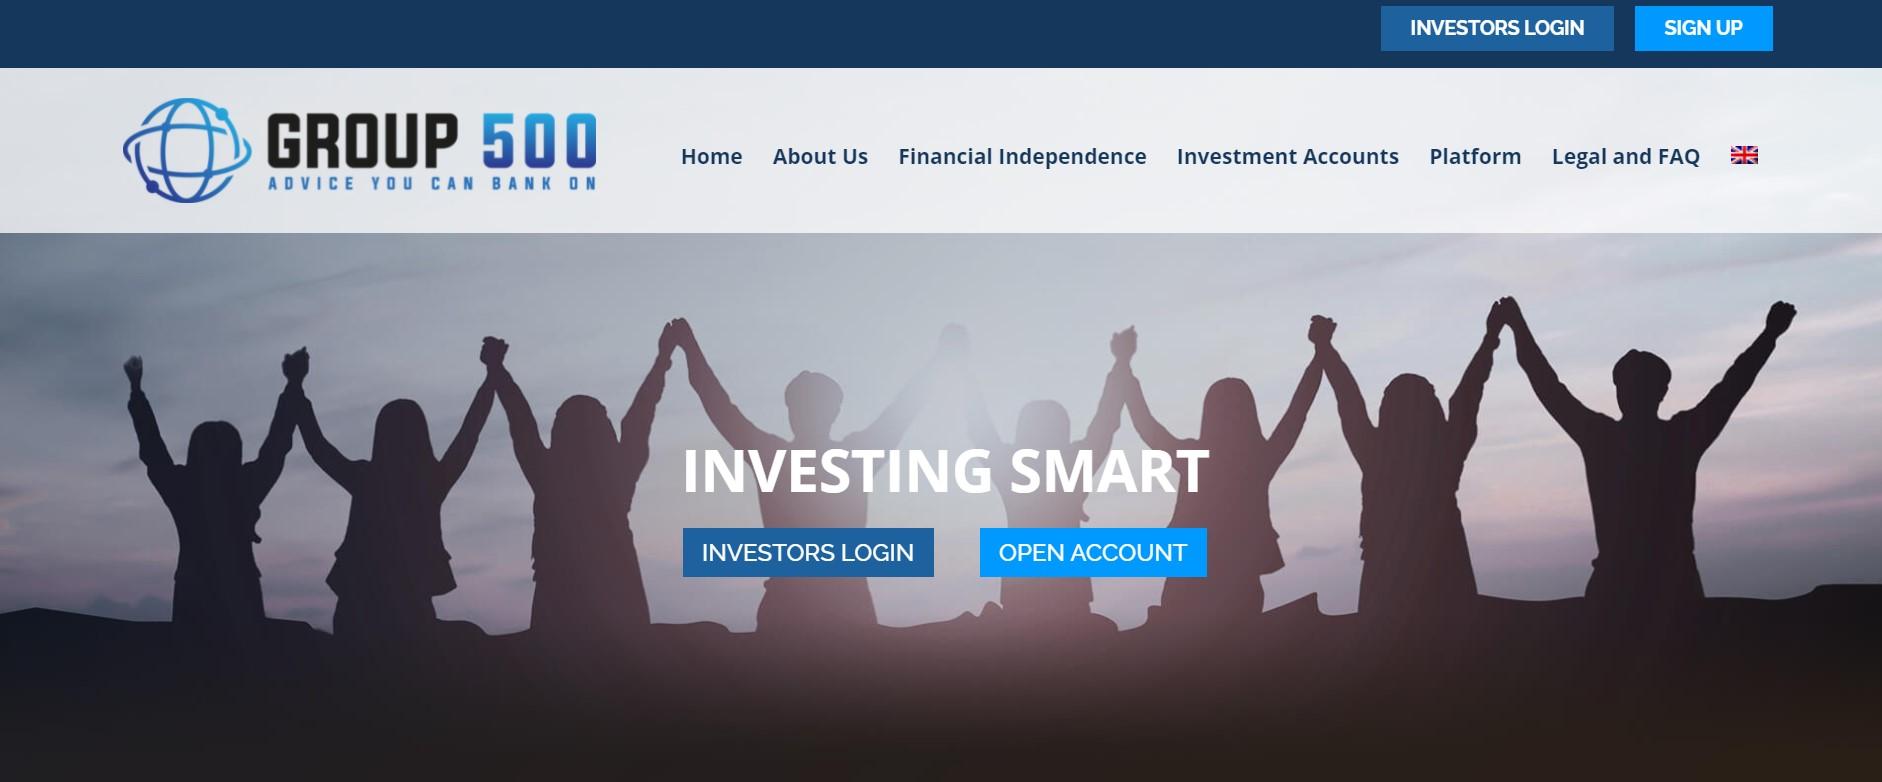 Group500 website